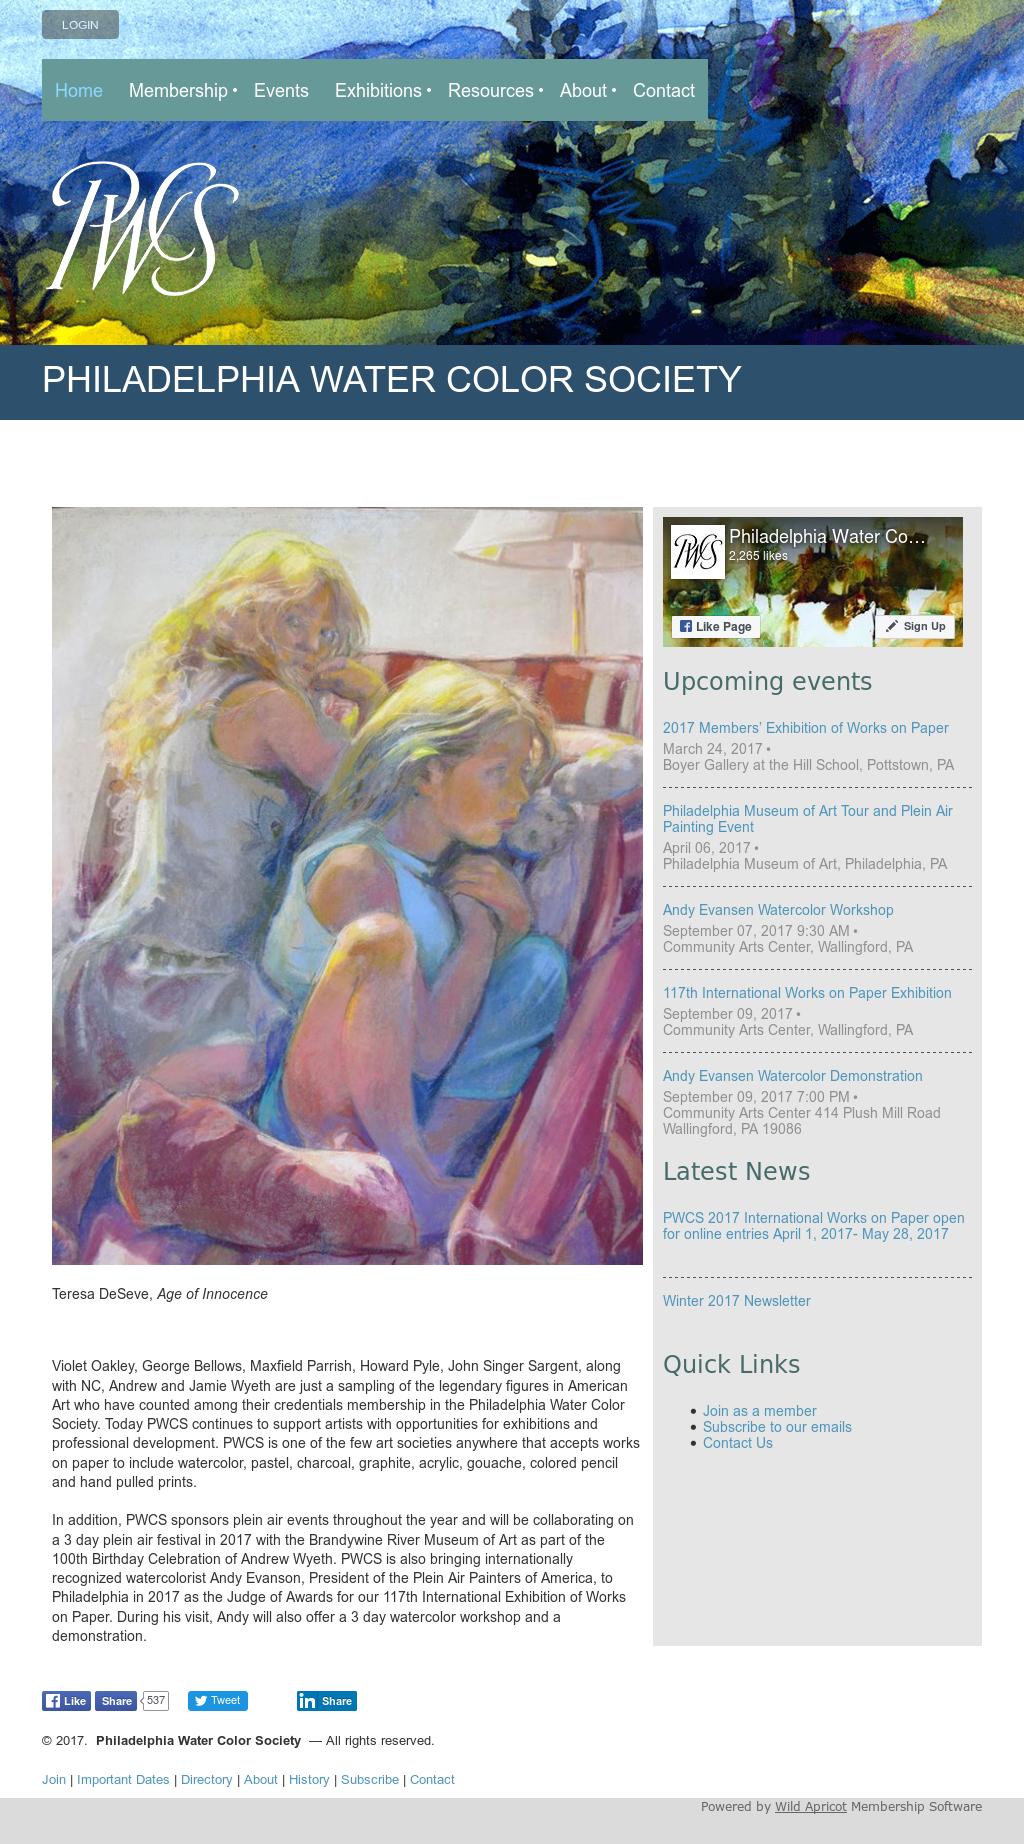 Philadelphia Water Color Society Competitors, Revenue and